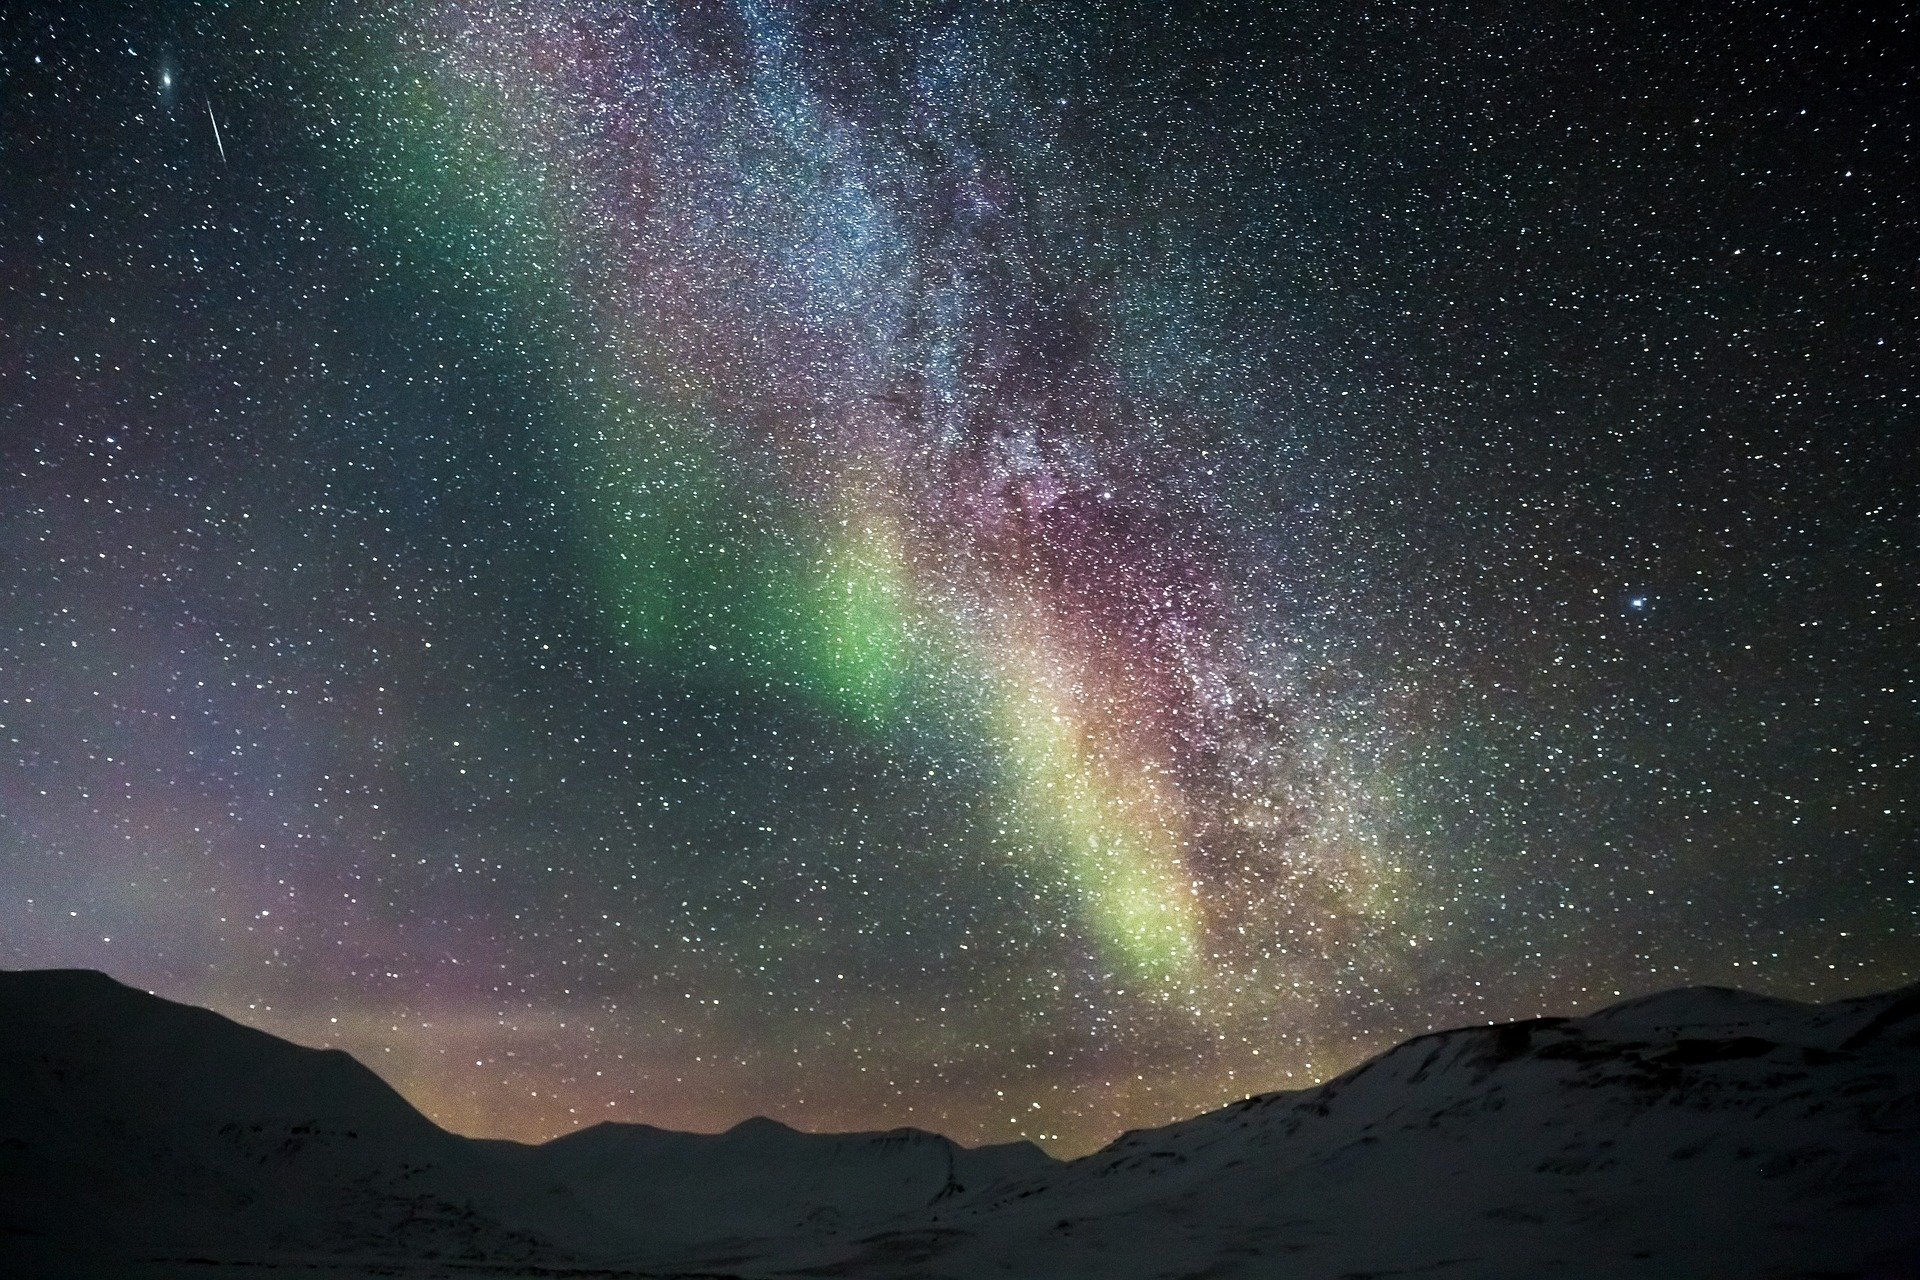 Cerul noptii vazut de la Polul Nord